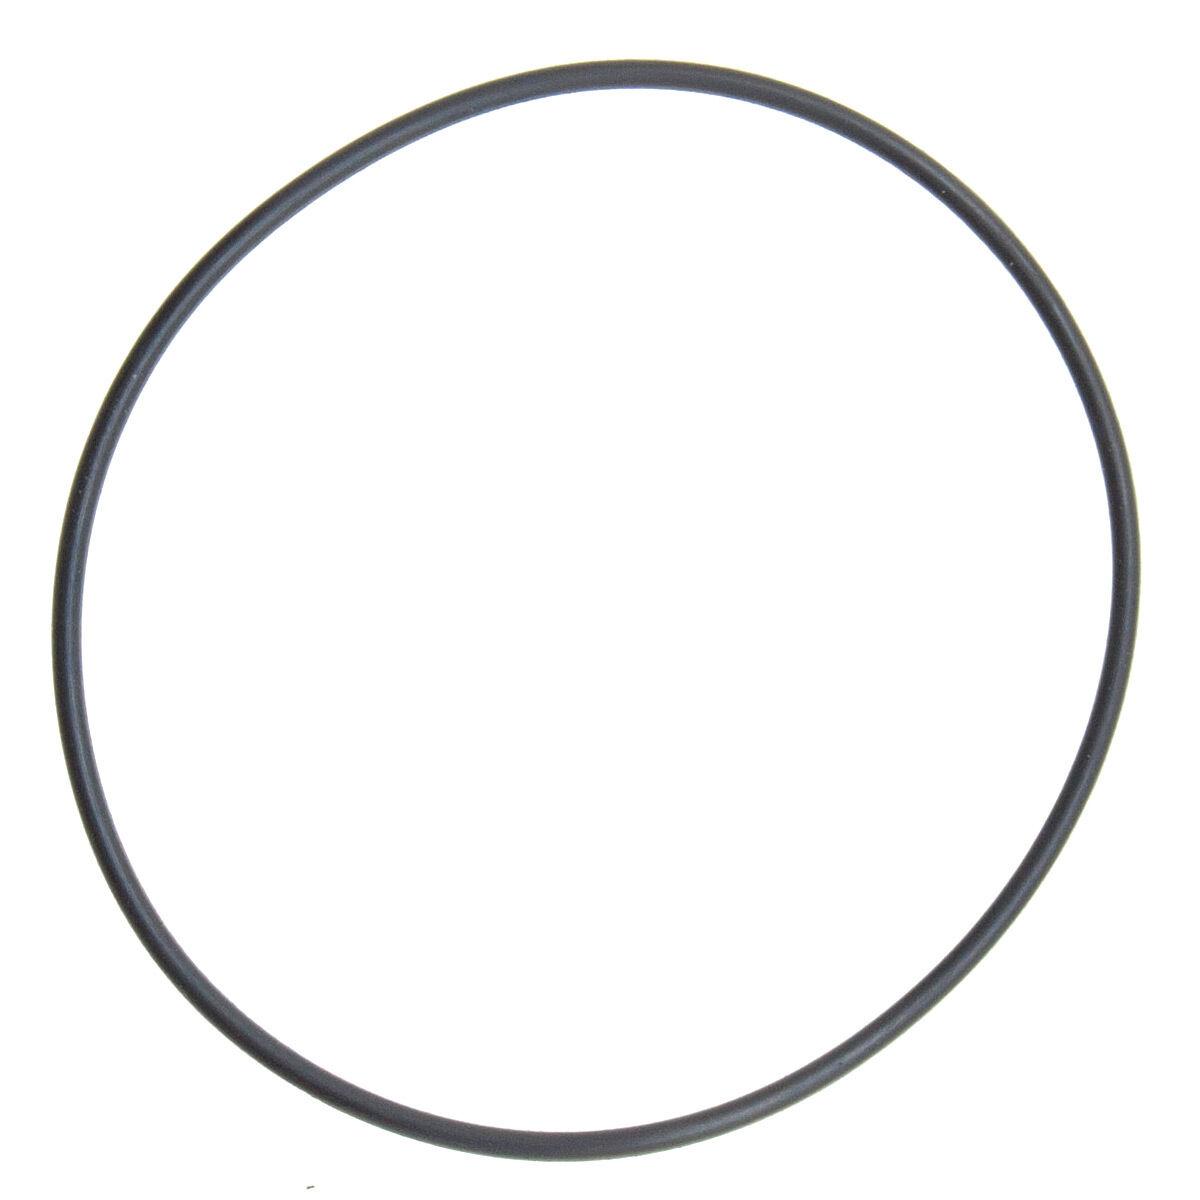 Menge 10 St/ück Dichtringe//O-Ringe 47 x 3 mm NBR 70